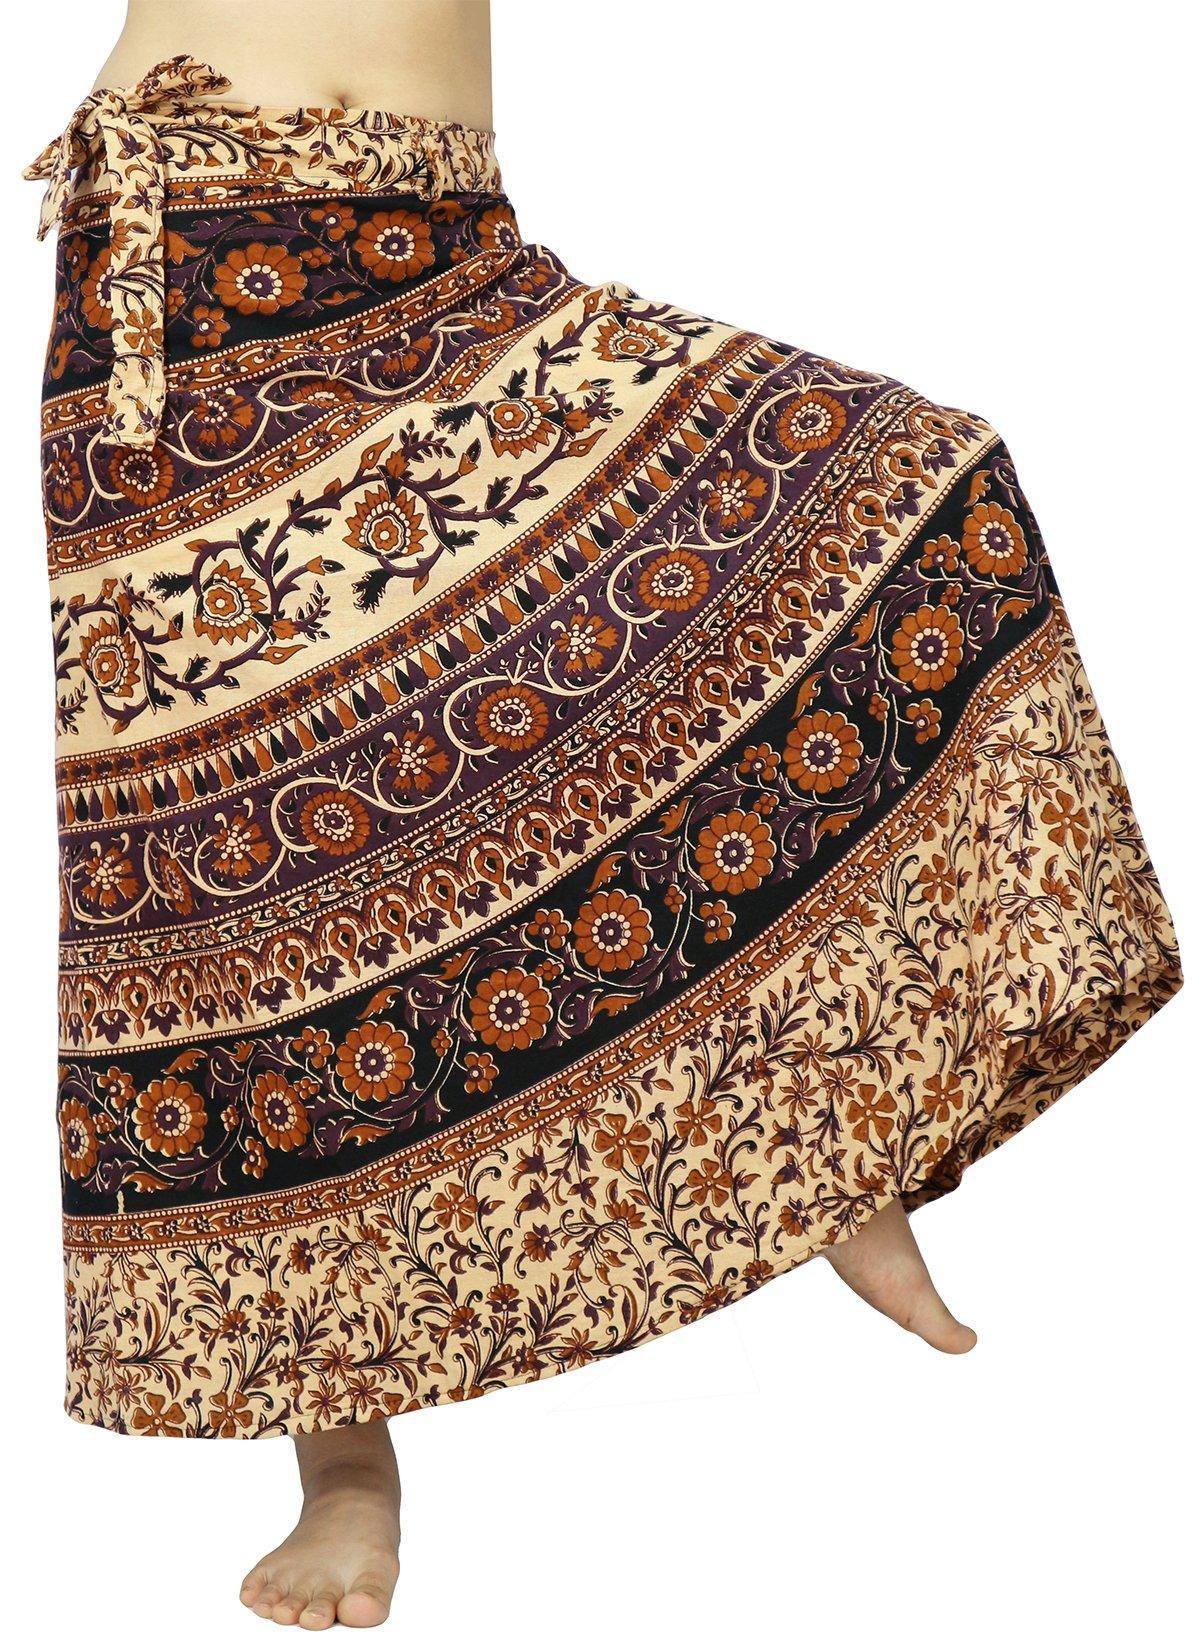 Lovely Creations Women's Long Cotton Boho Bohemian Hippie Indian Wrap Skirt (B Purple Orange)